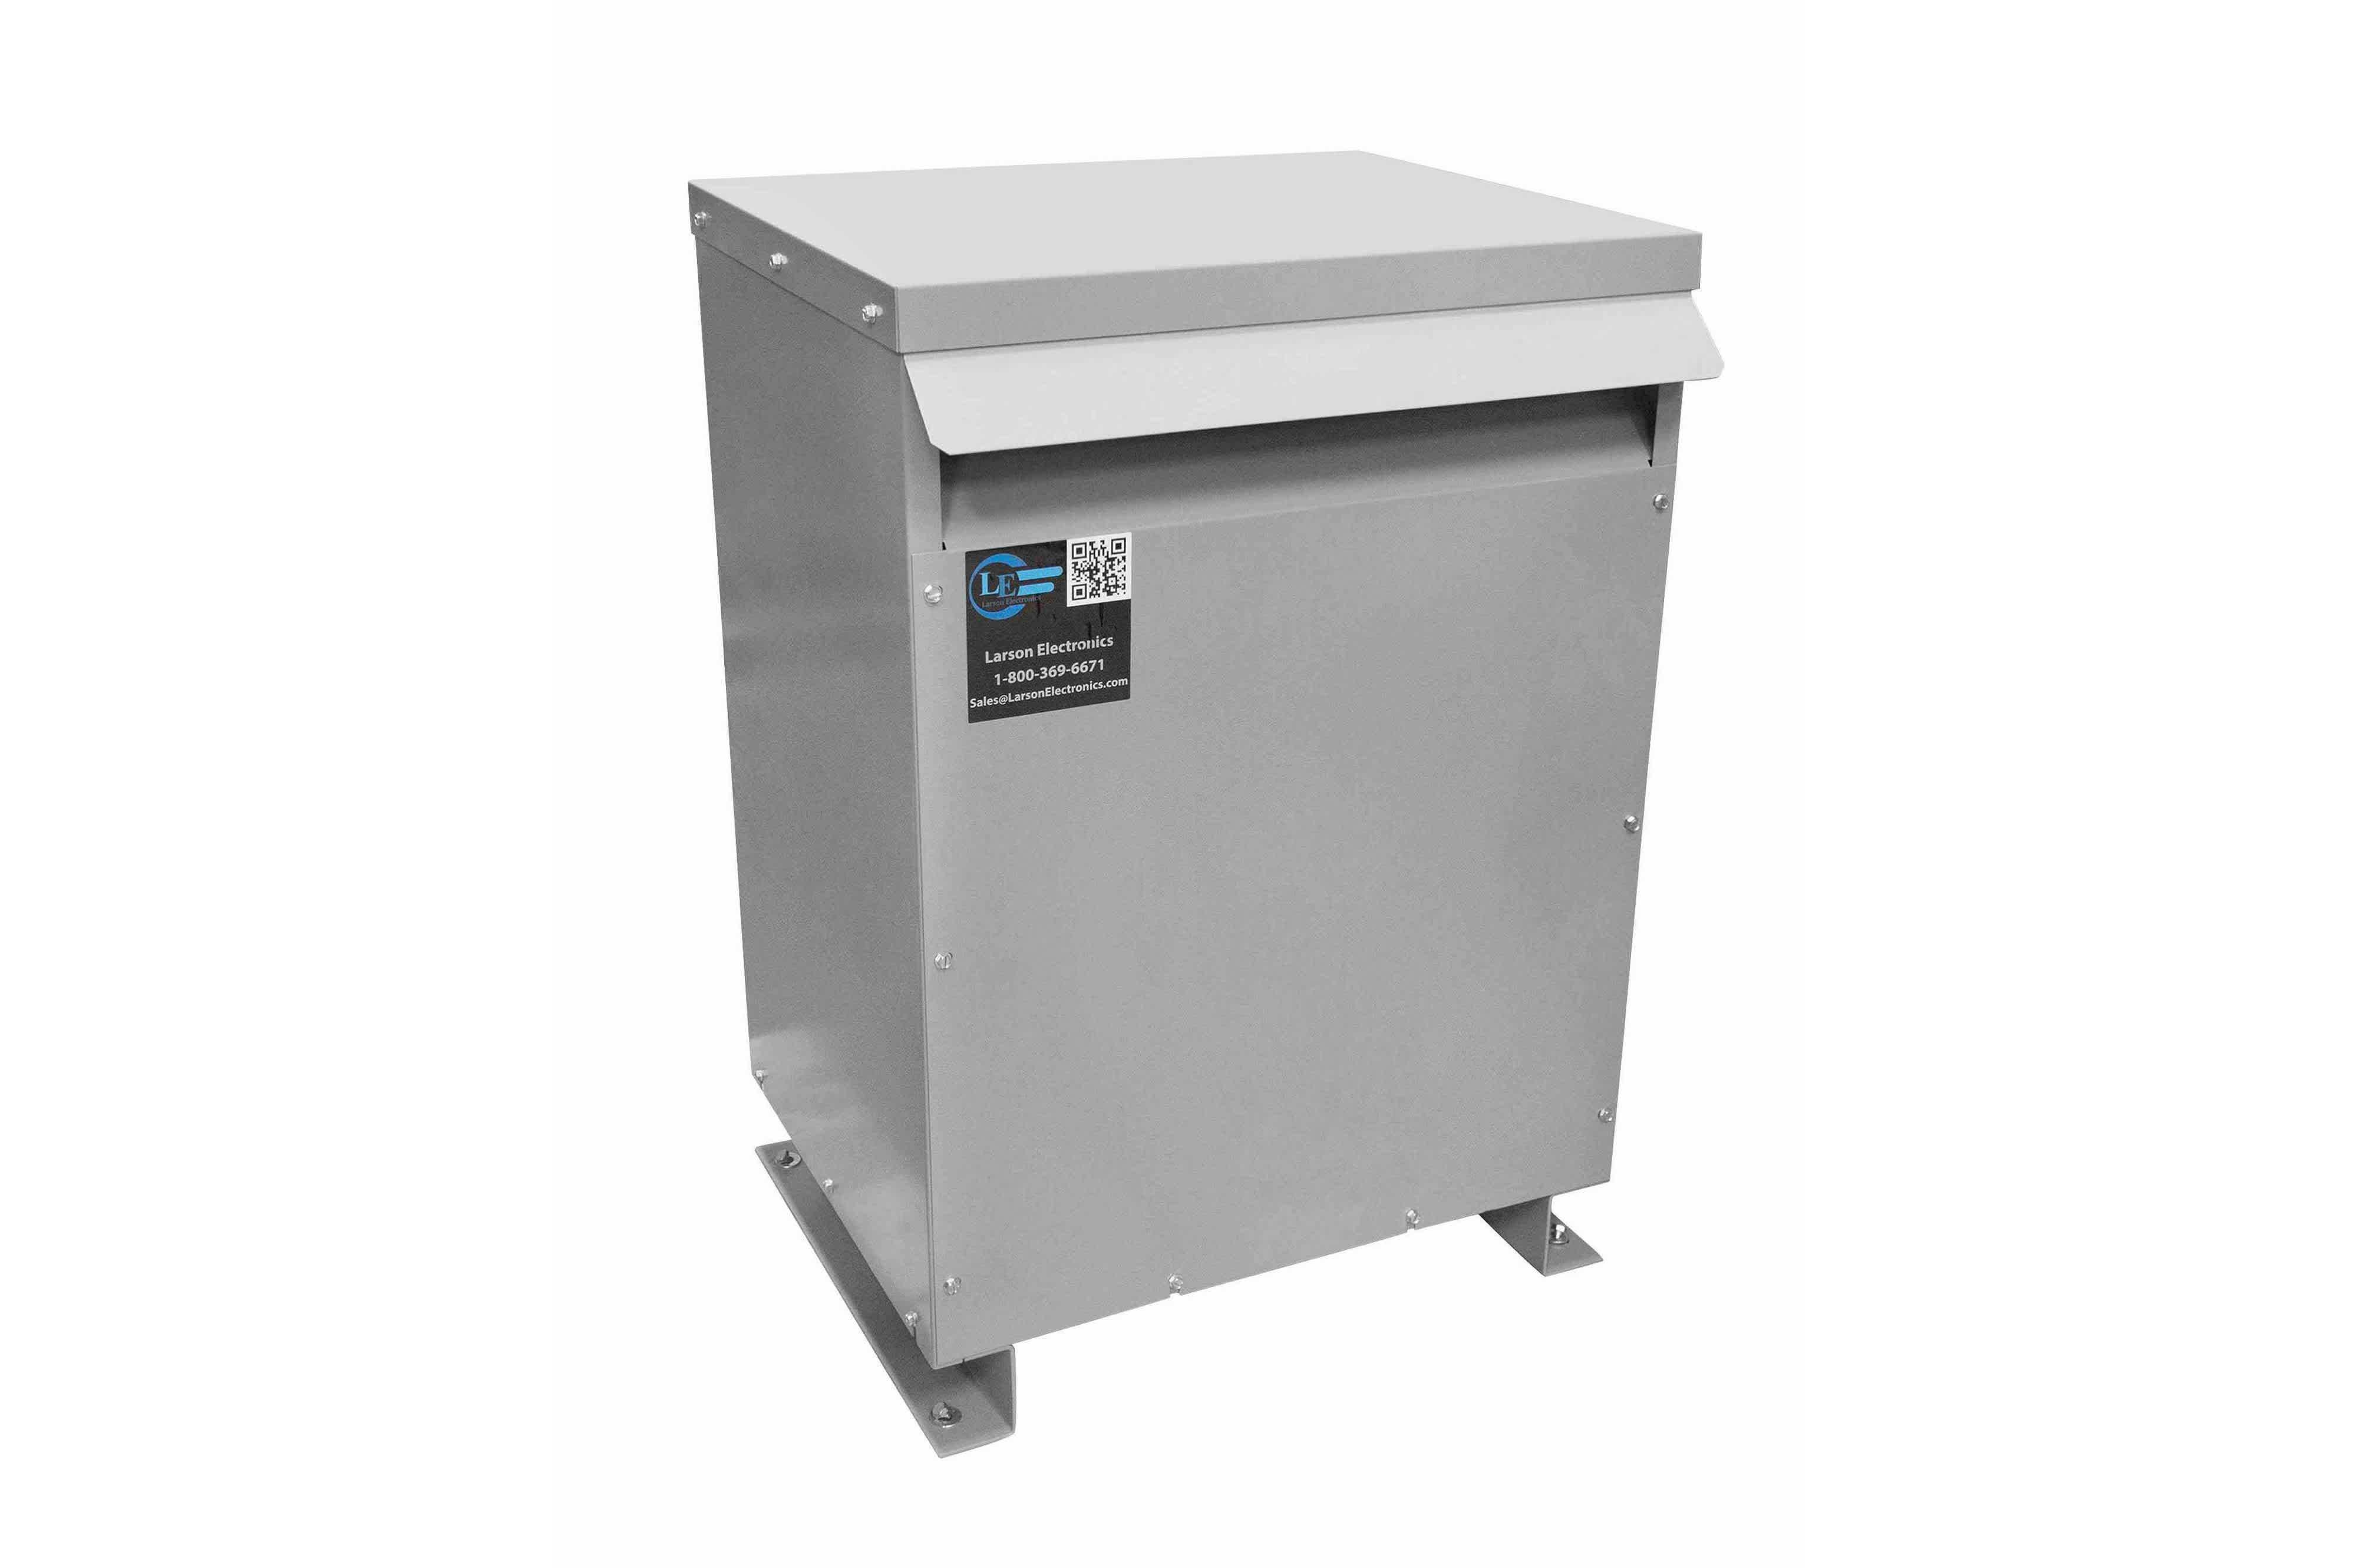 1000 kVA 3PH Isolation Transformer, 240V Wye Primary, 380Y/220 Wye-N Secondary, N3R, Ventilated, 60 Hz